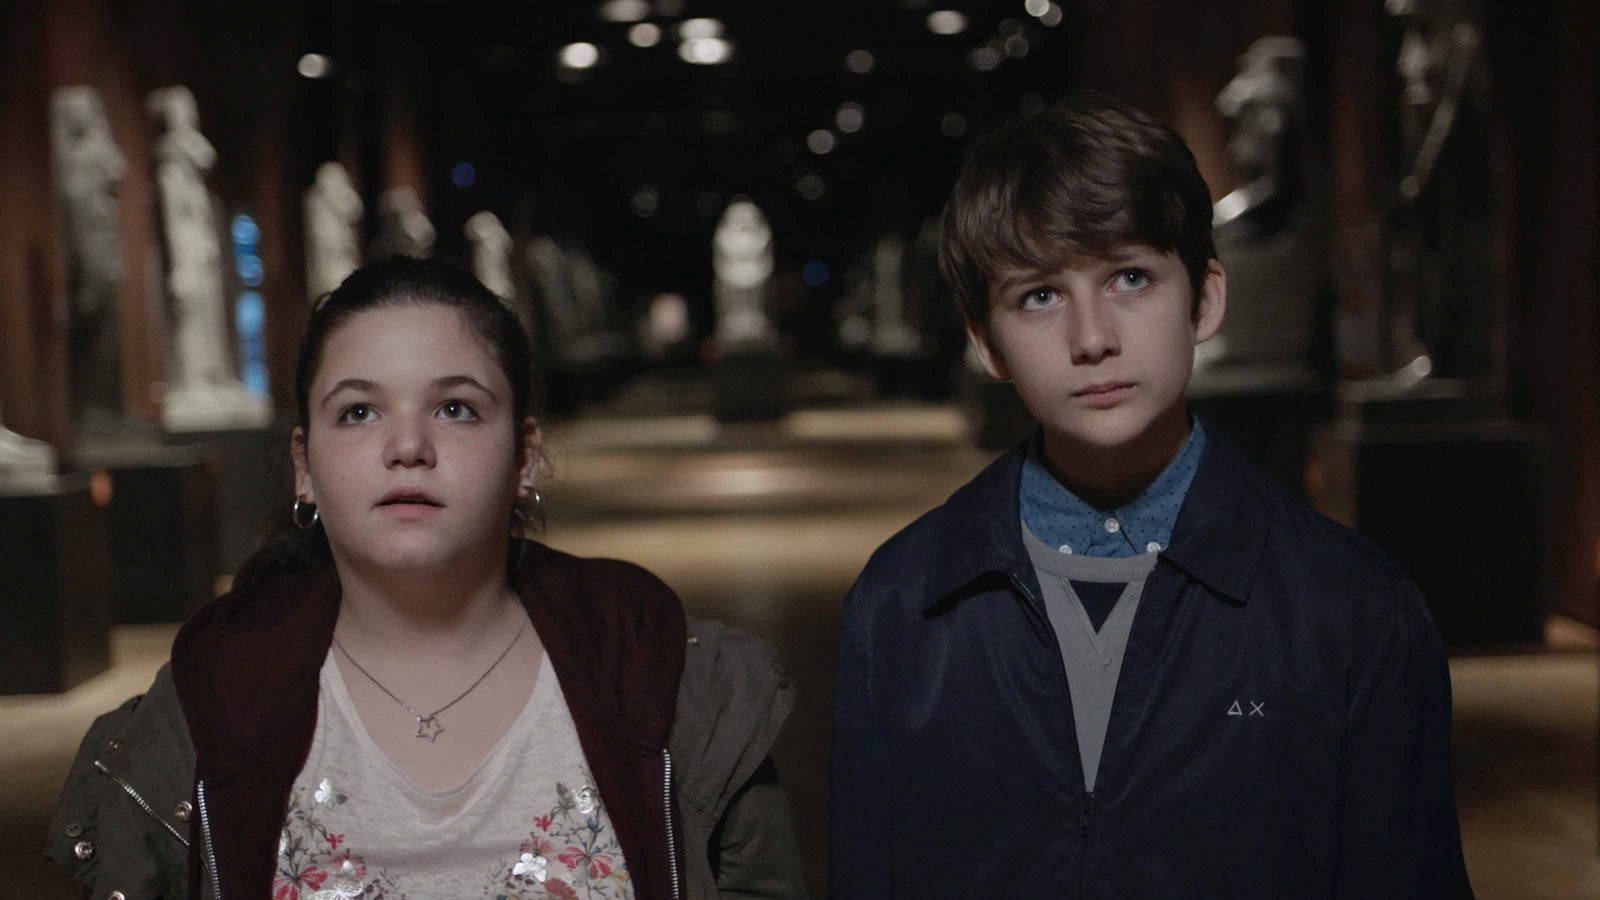 Francesca Giordano and Yan Shevchenko in Bene ma non benissimo (2018)